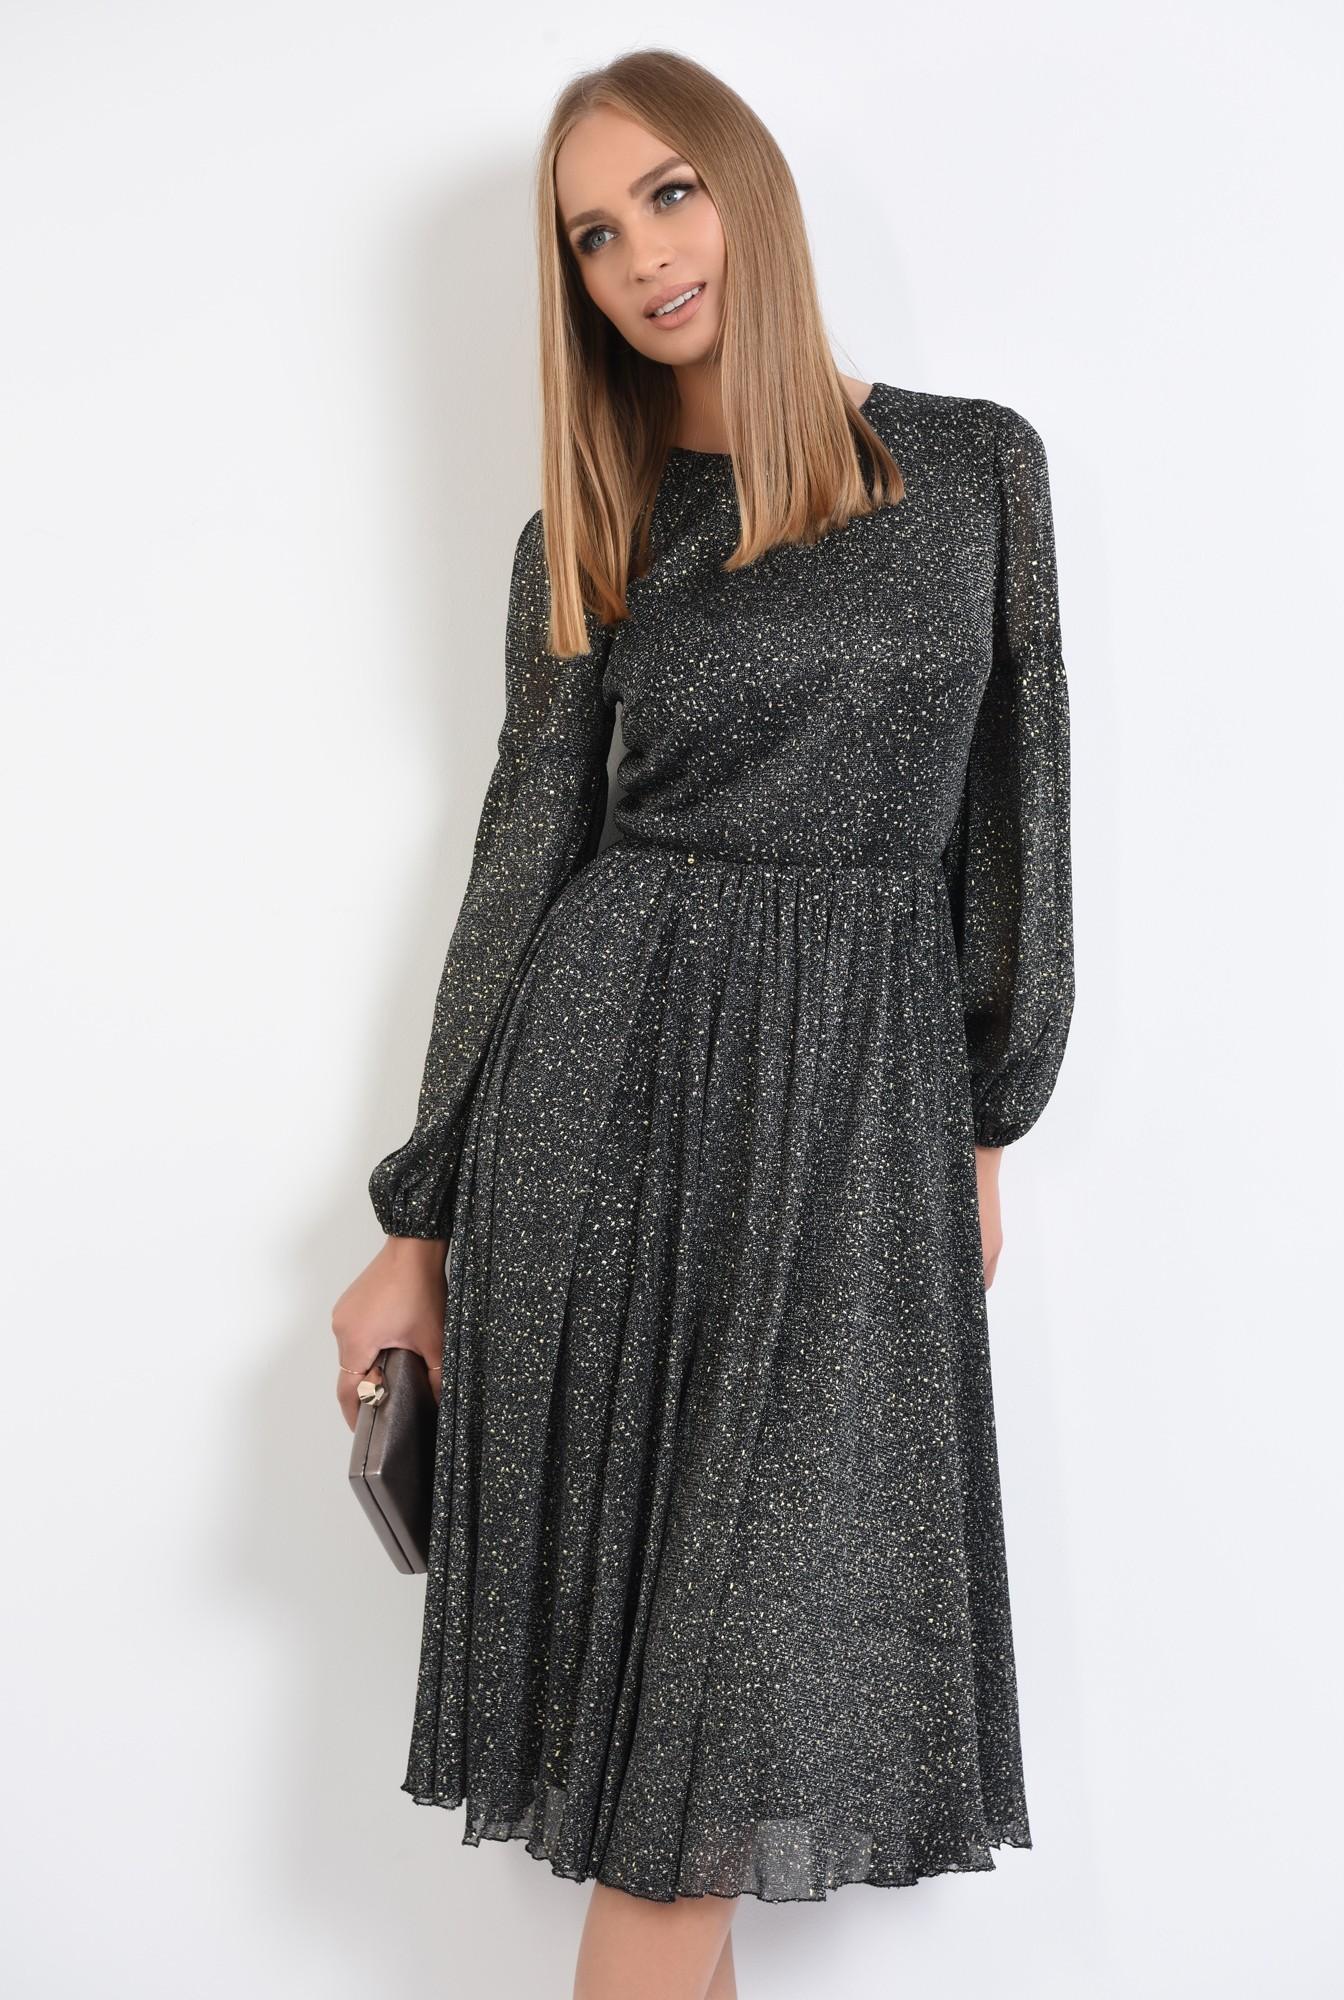 2 - rochie de seara, detalii aurii, rochii online, croi clos